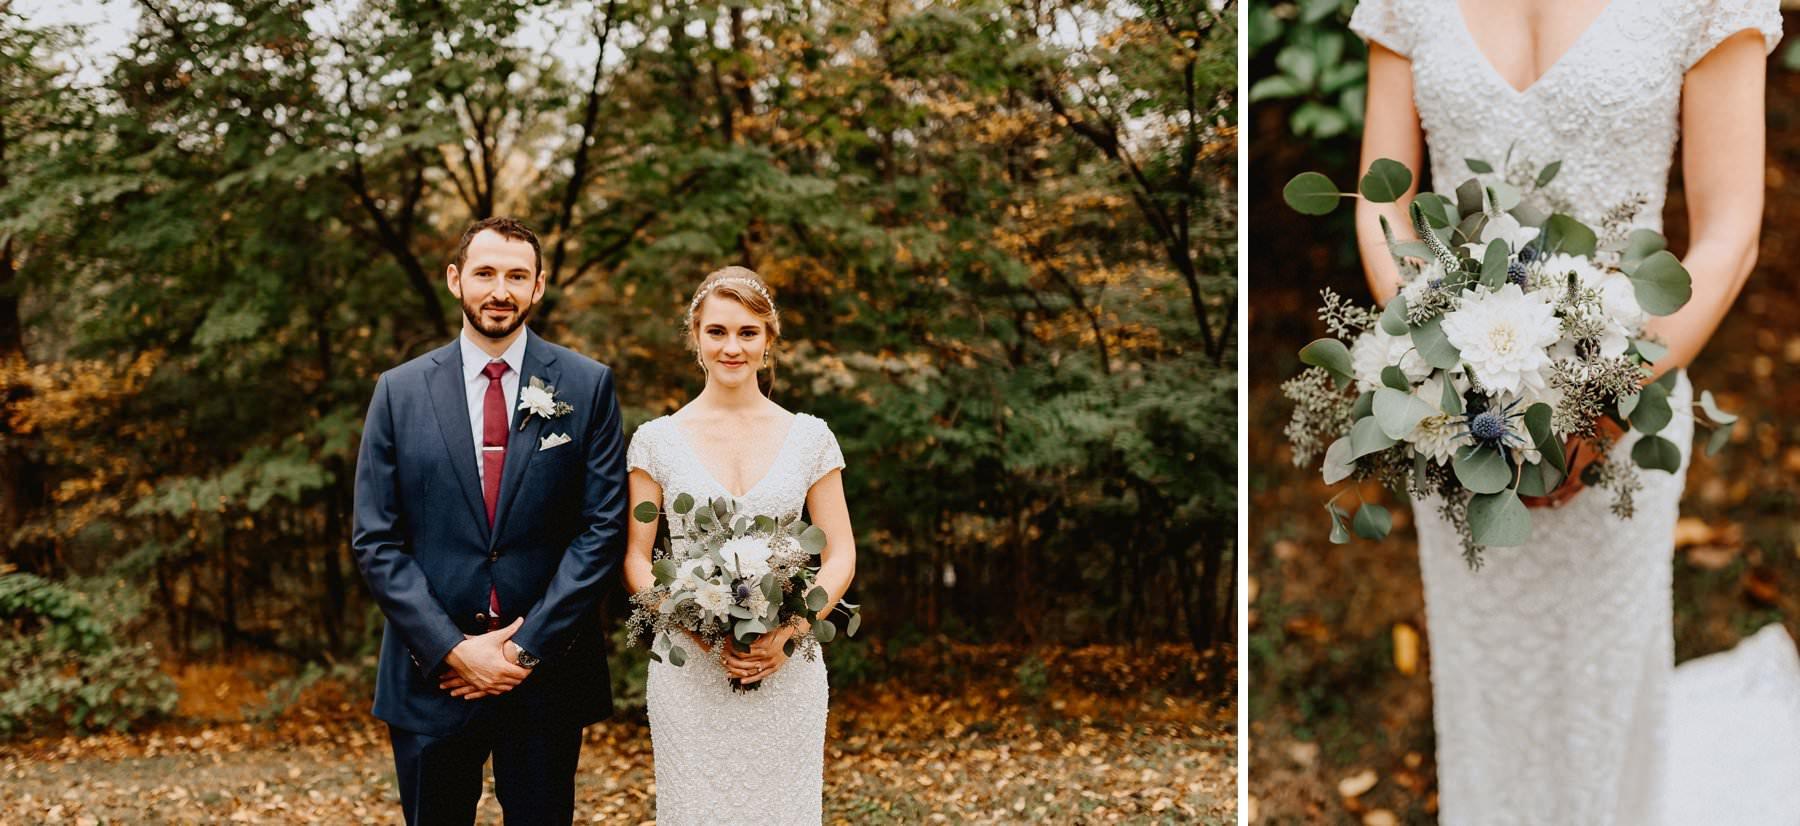 John_James_Audubon_Center_wedding-34.jpg